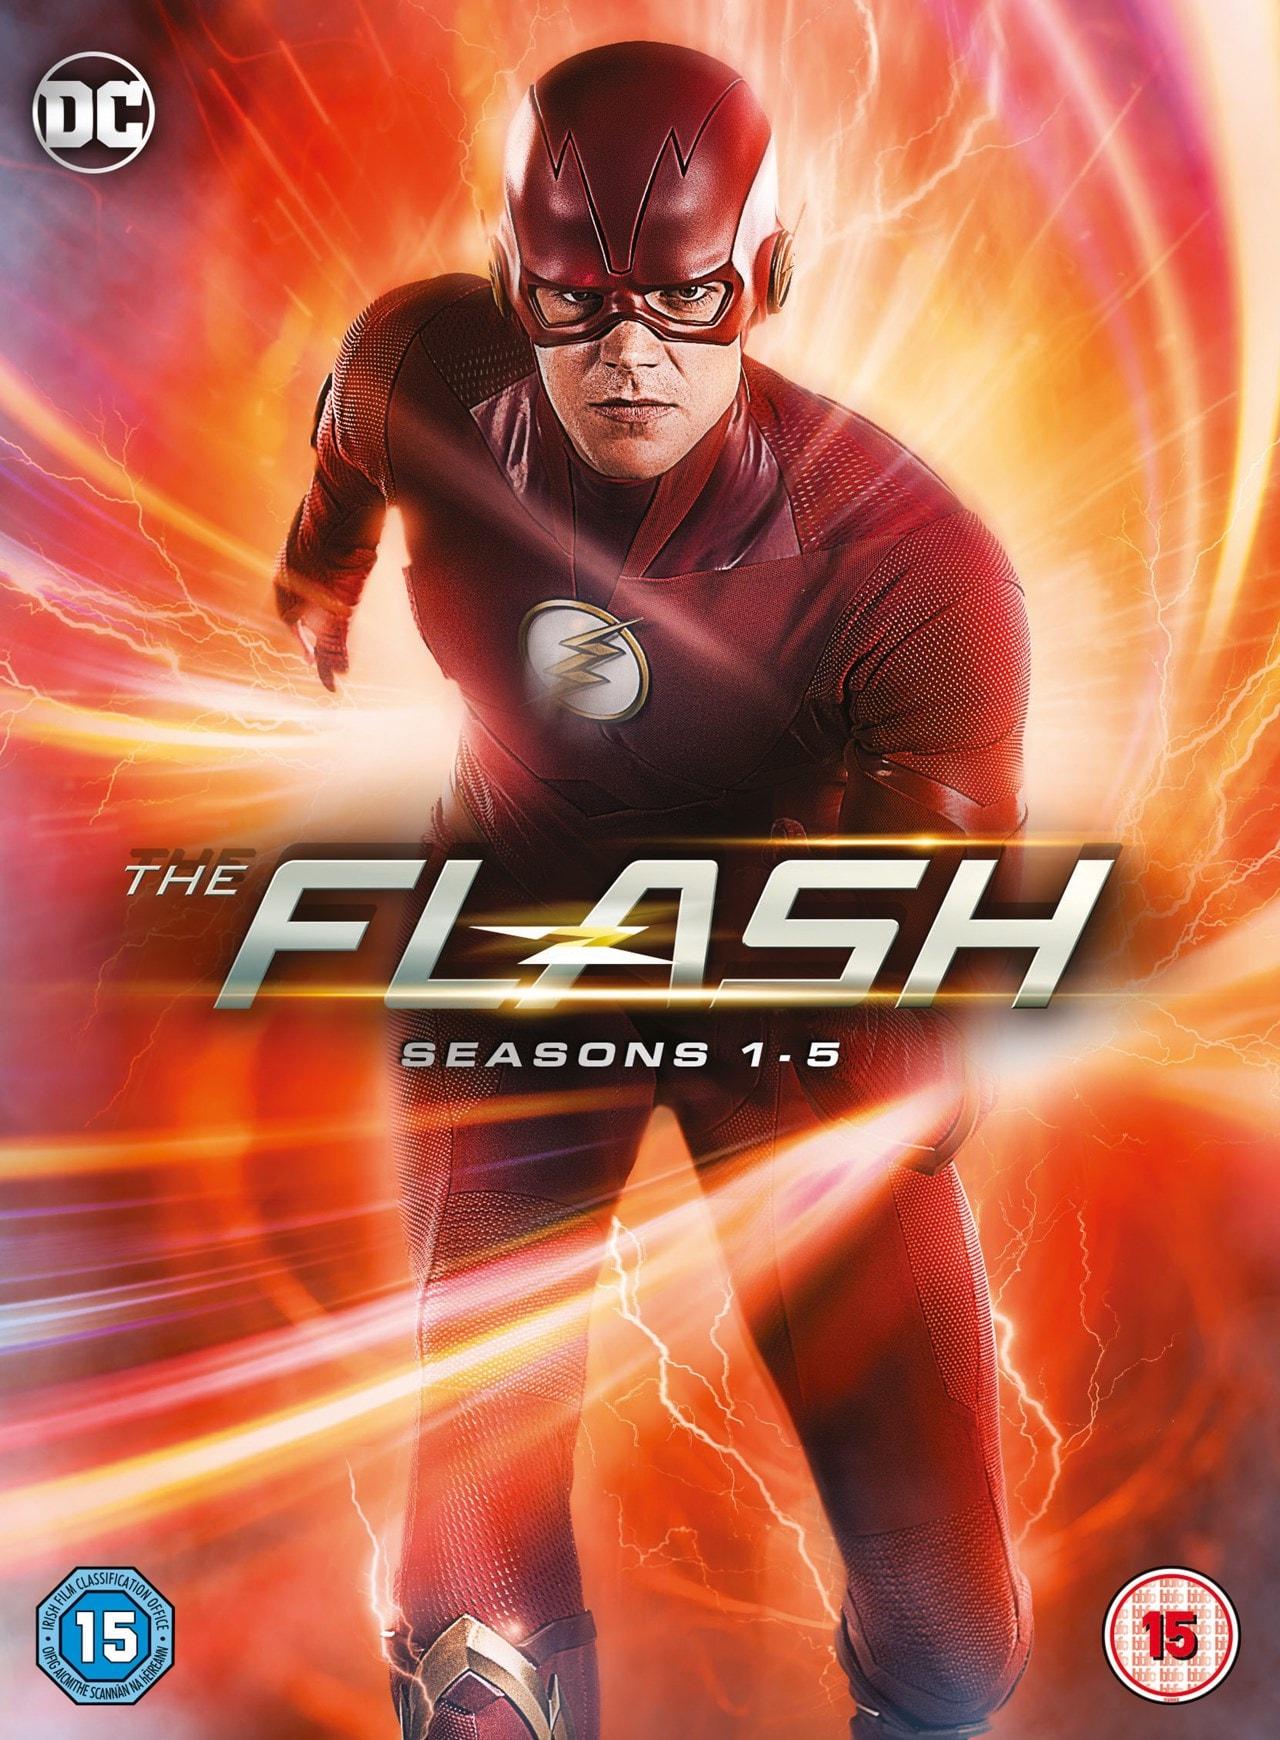 The Flash: Seasons 1-5 - 1